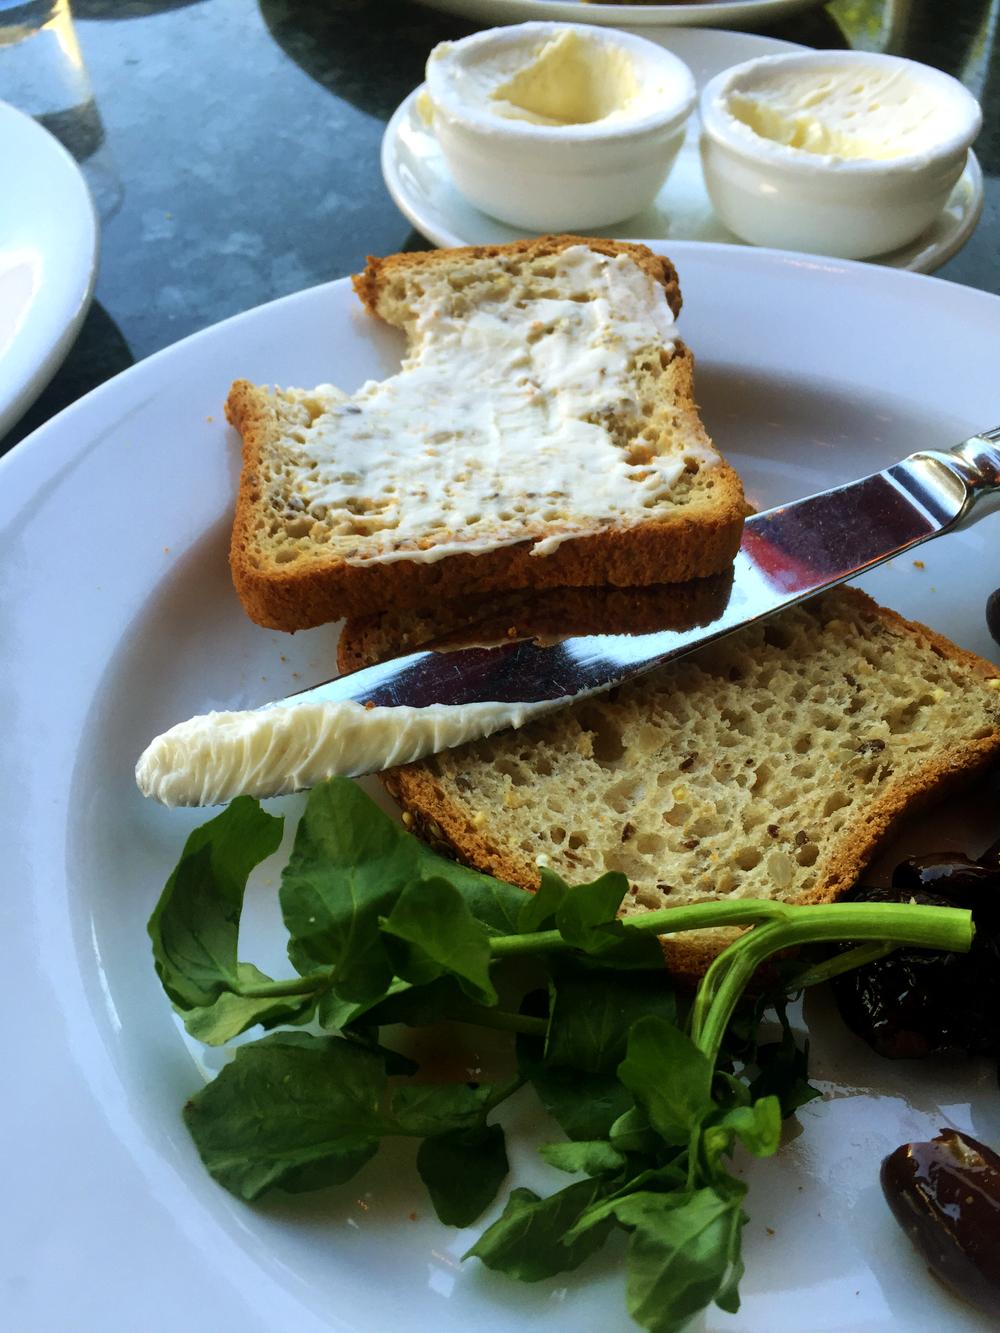 Complimentary Gluten Free Bread